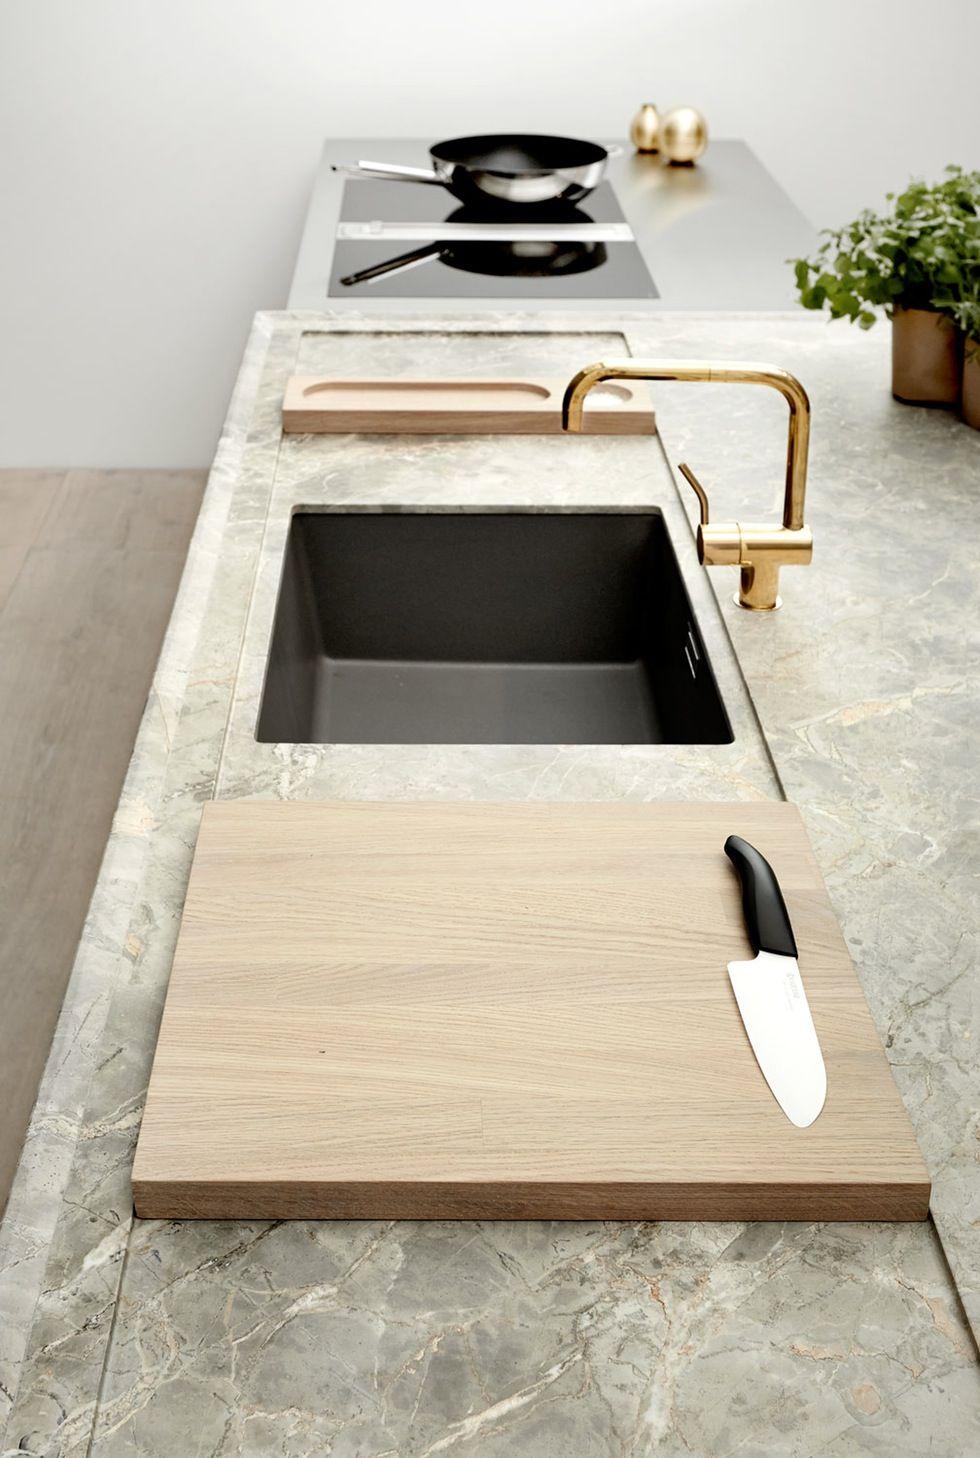 kps küchenplanung großartige bild oder febdfdccafc jpg